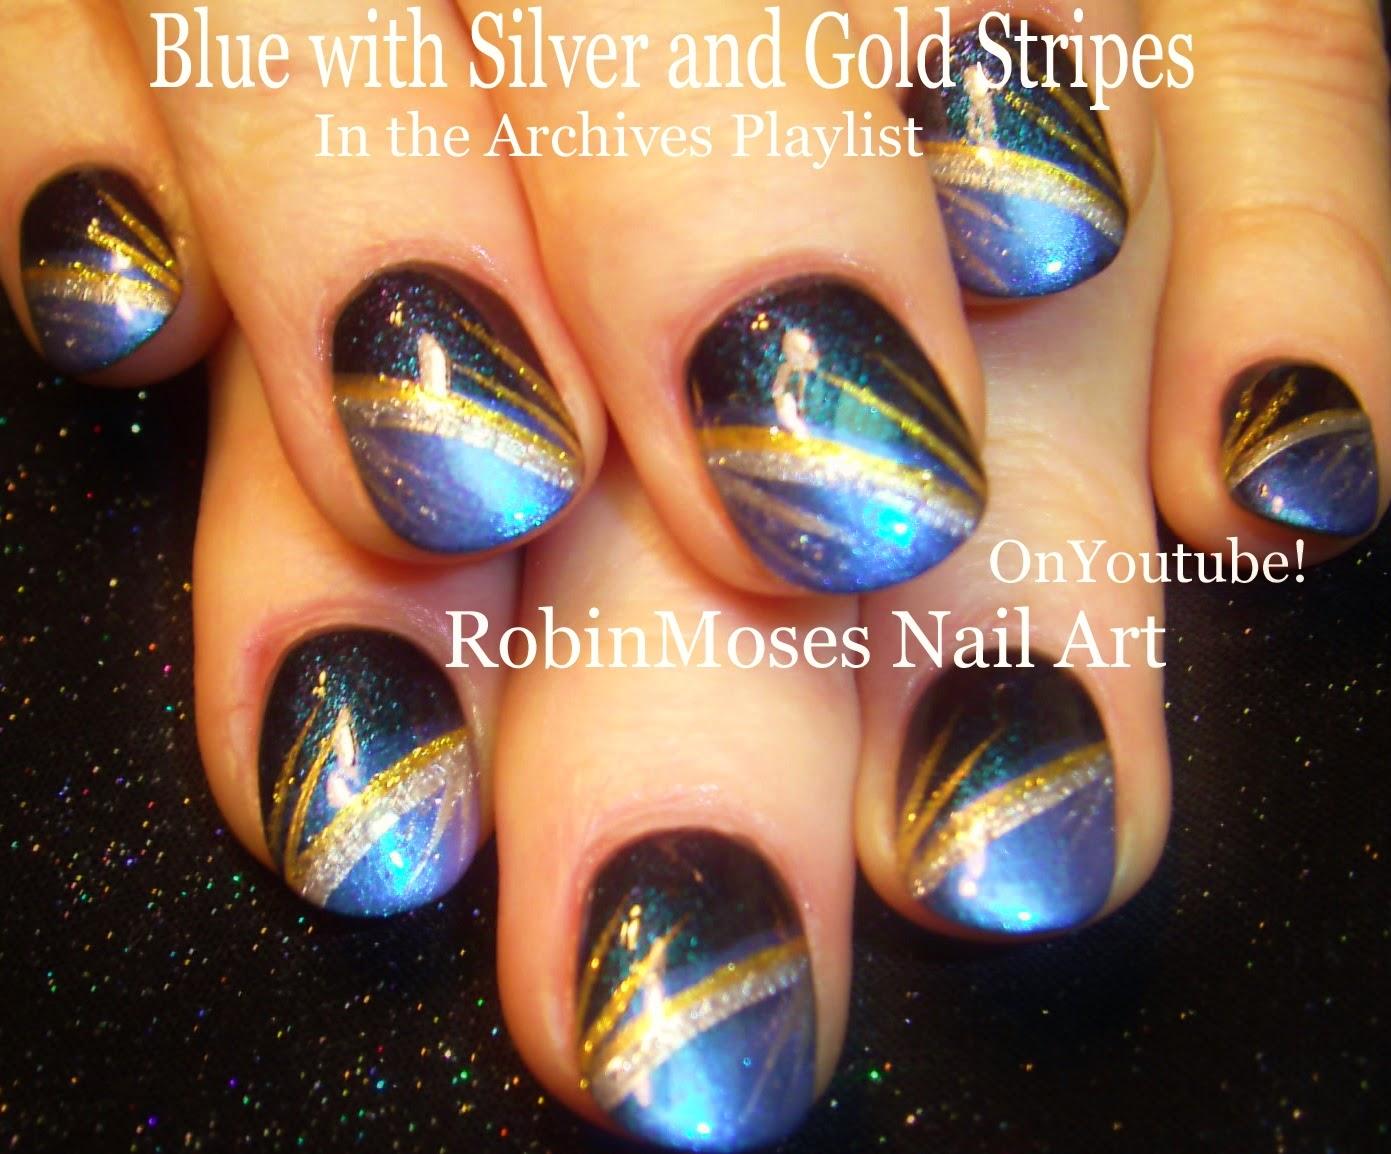 Robin moses nail art splatter paint nail art technique with blue cute nail art playlist diy easy nail tutorials cute nail designs nail art for beginners to advanced nail techs prinsesfo Images